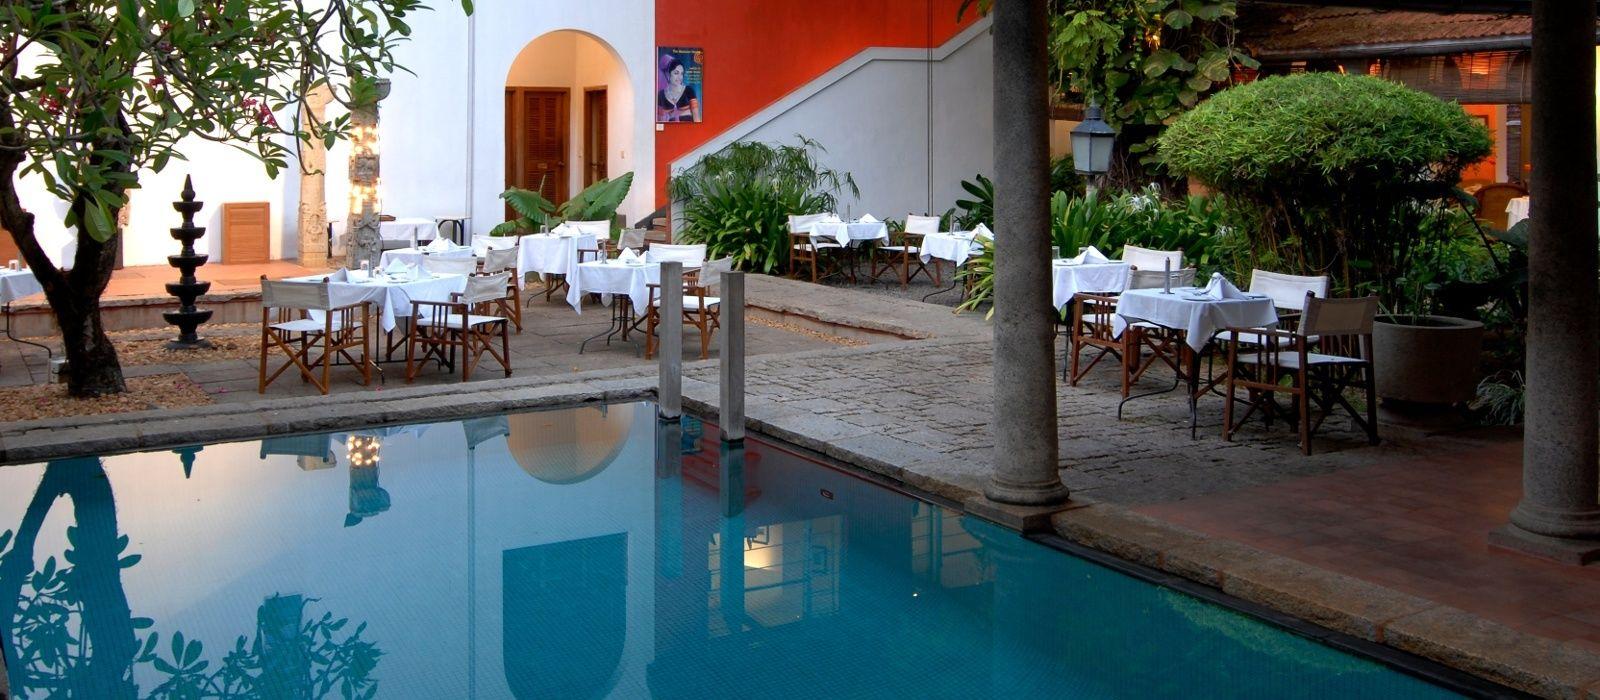 Hotel Malabar House South India